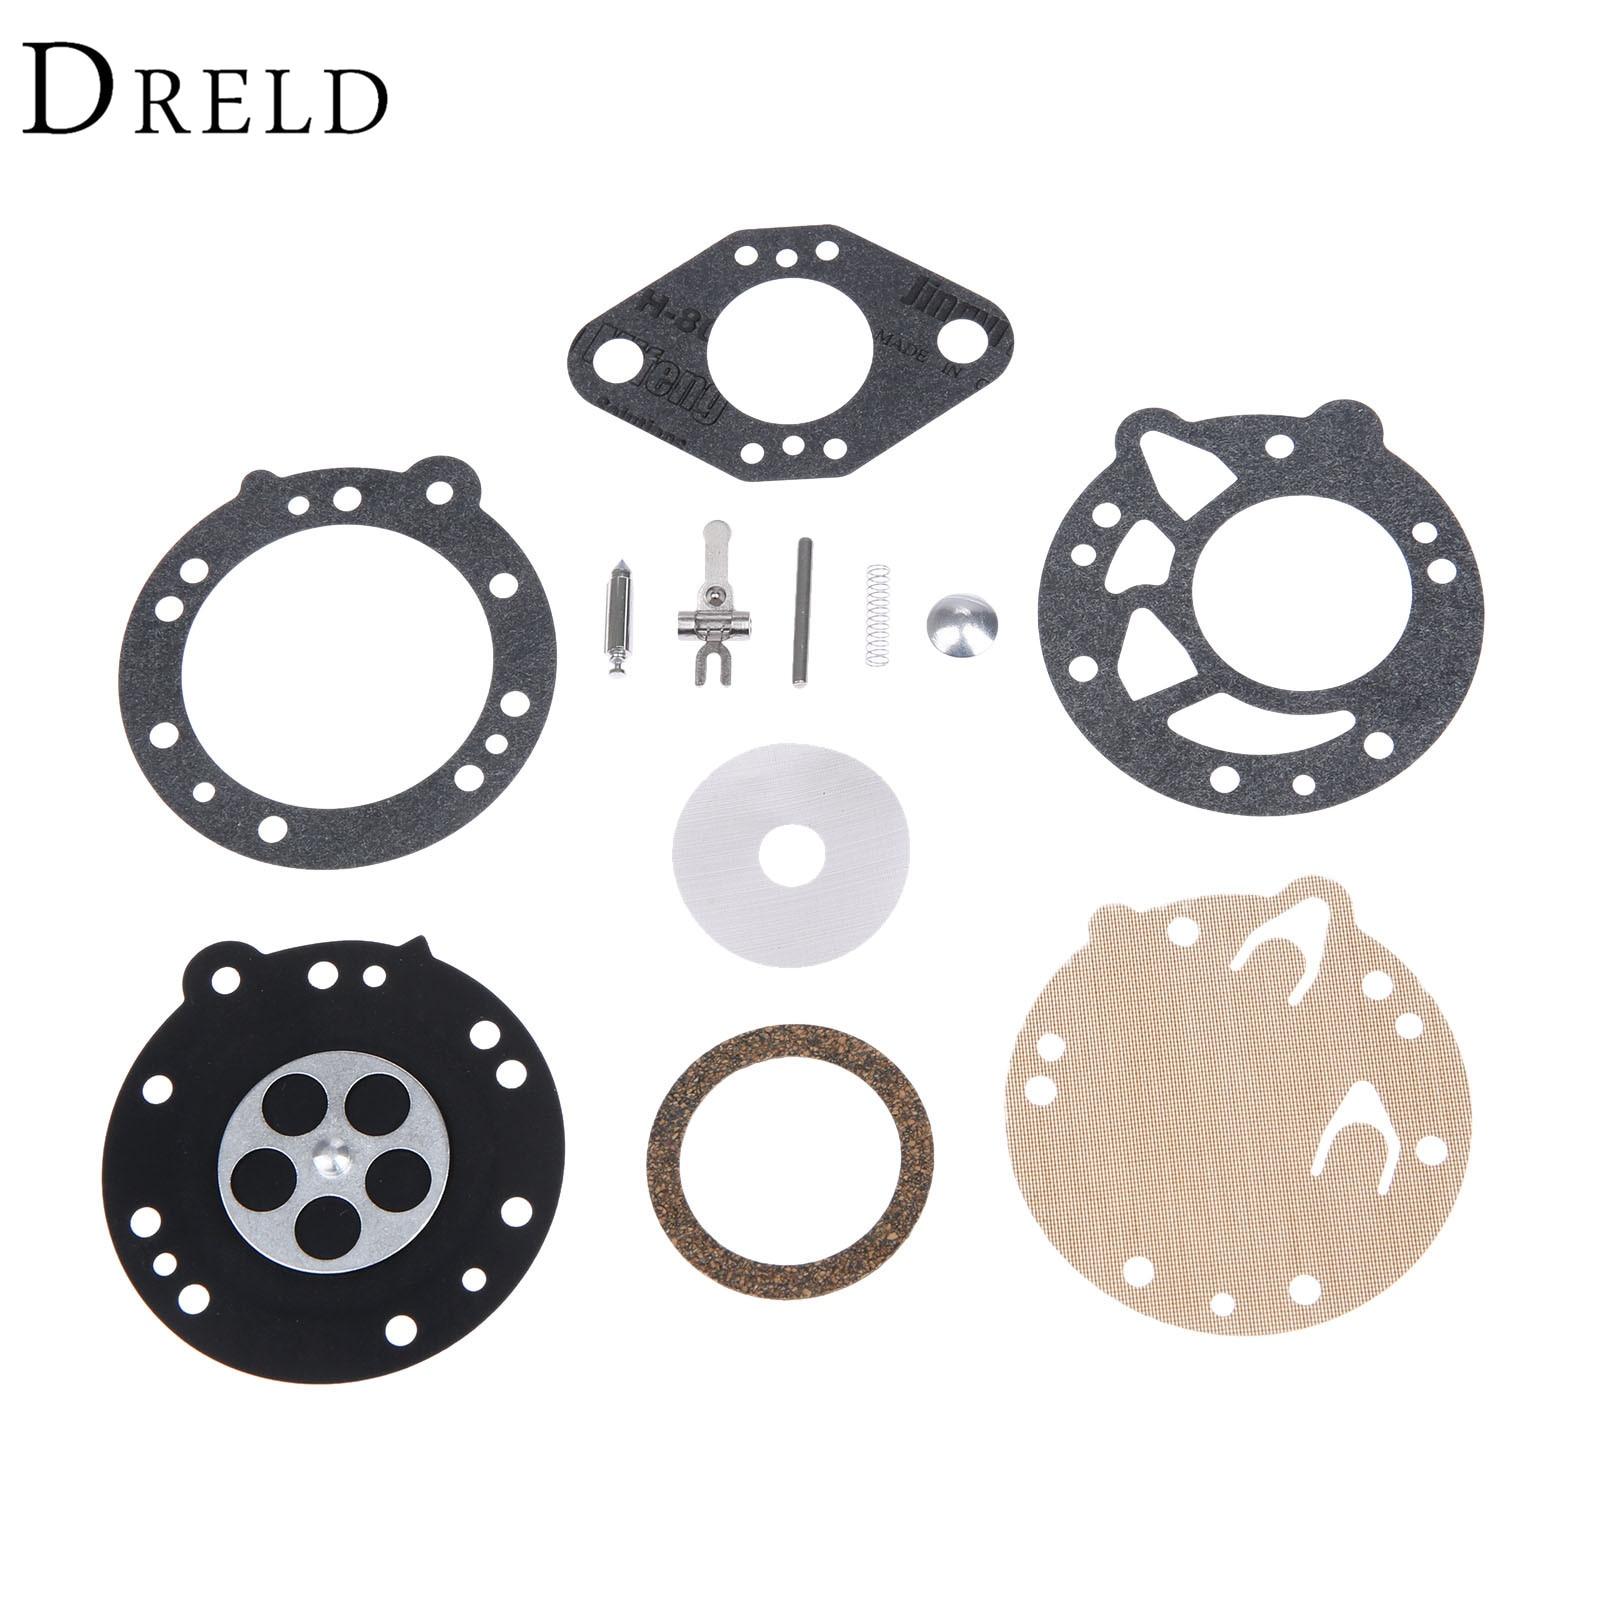 Kit de diafragma para la reconstrucción de carburador DRELD para STIHL 08 08S 070 090, motosierra TS350 TS360 TILLOTSON RK-83HL, reemplaza a Zama RB-42